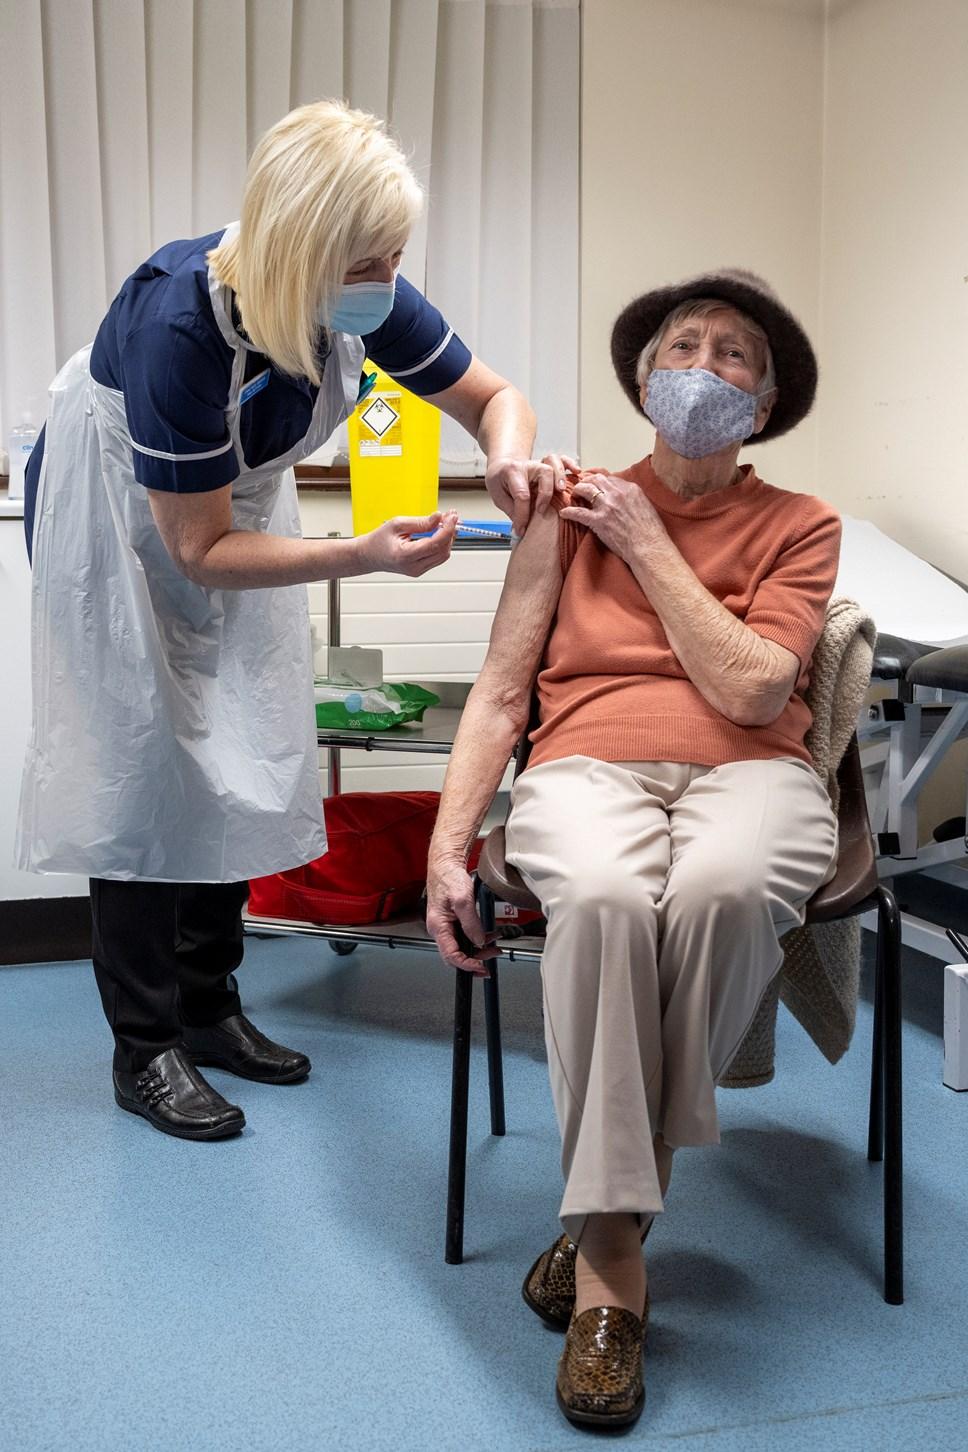 mhorwood Covid 19 Oxford-Astrazeneca Vaccine 040121 30